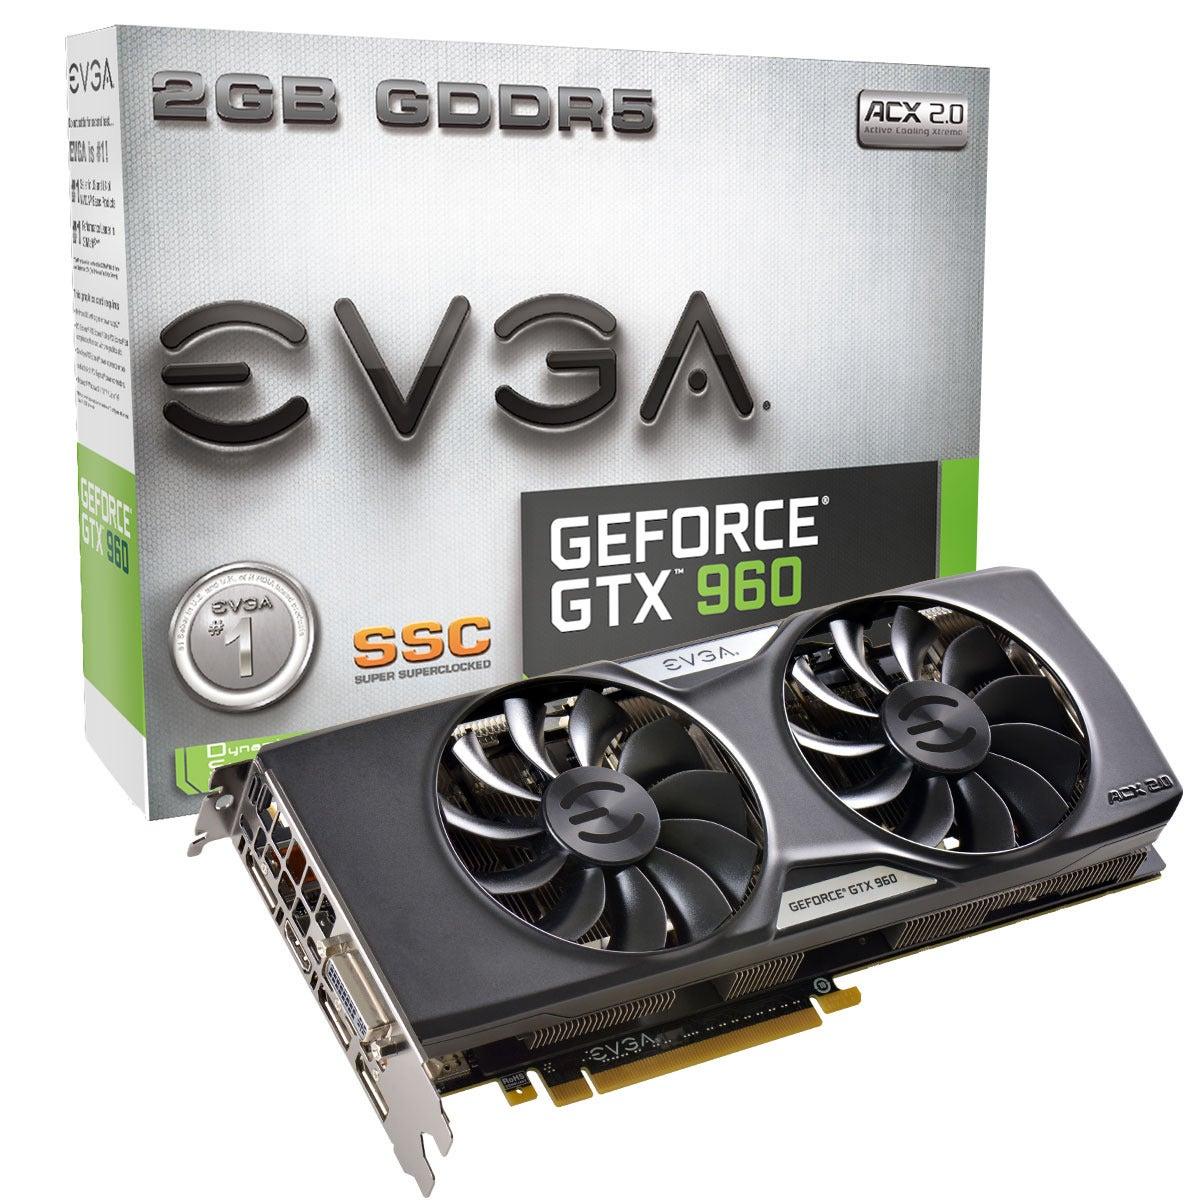 Msi nvidia geforce gtx 970 gaming 4g